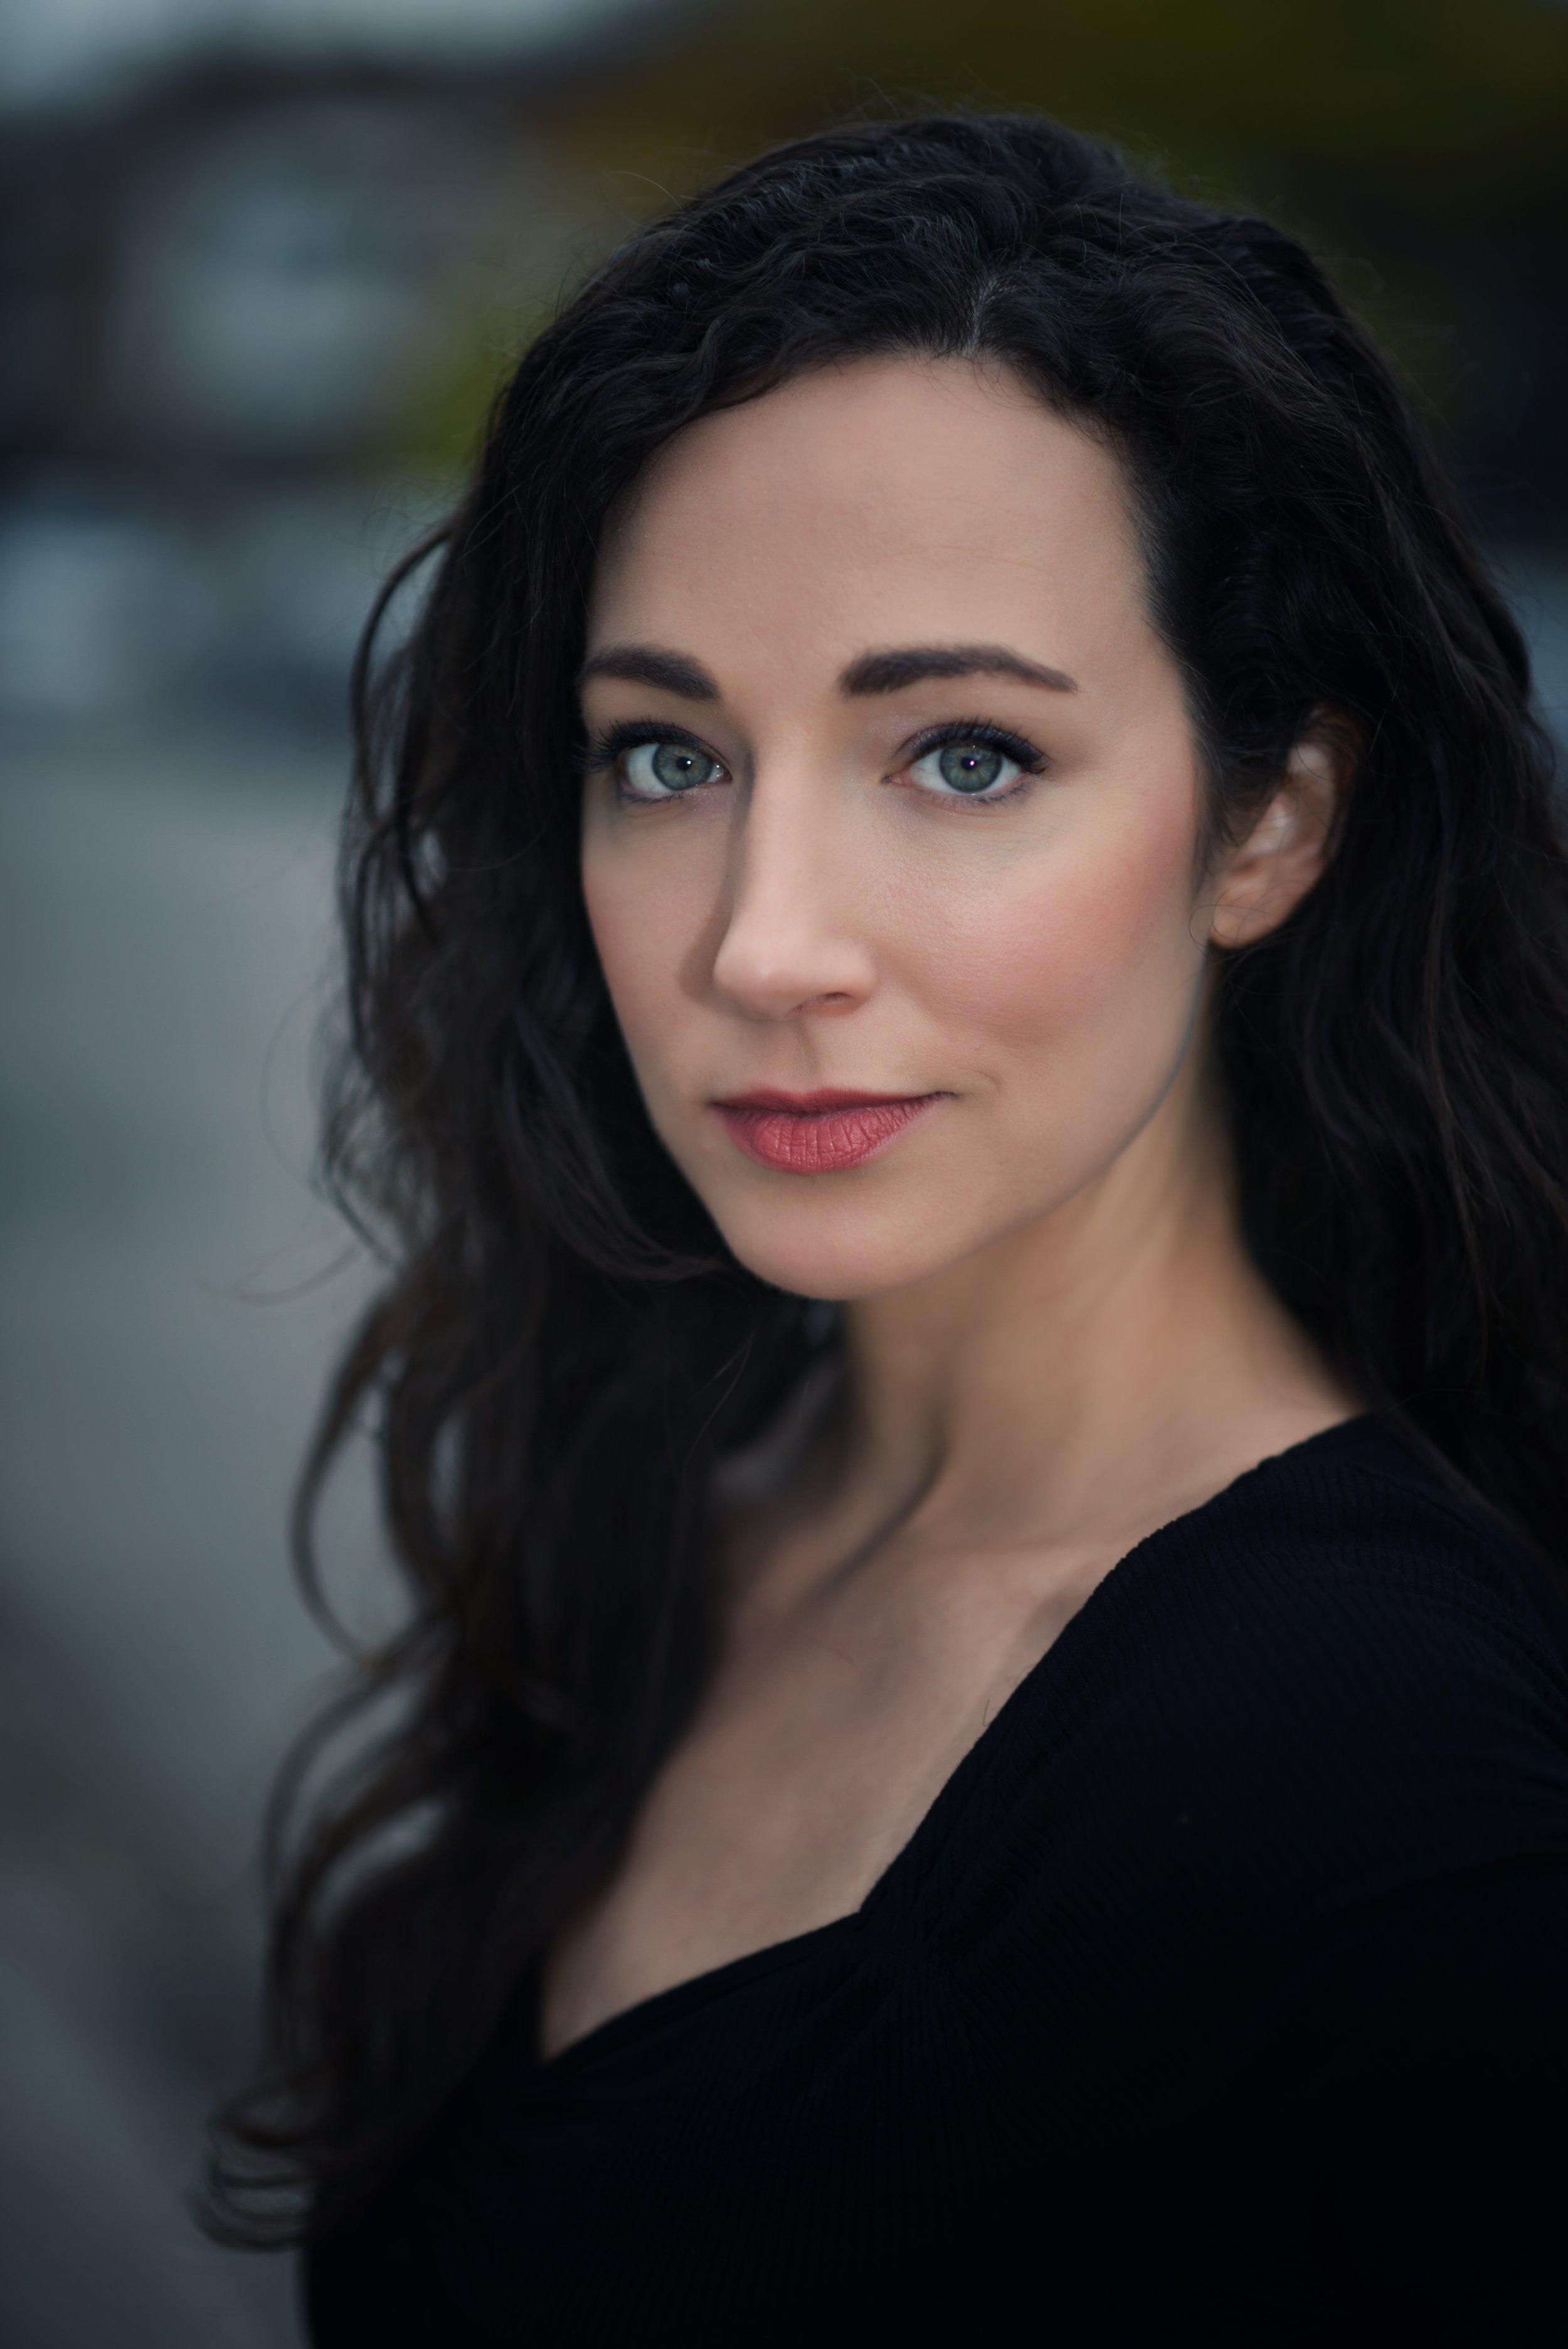 Kira McCarthy